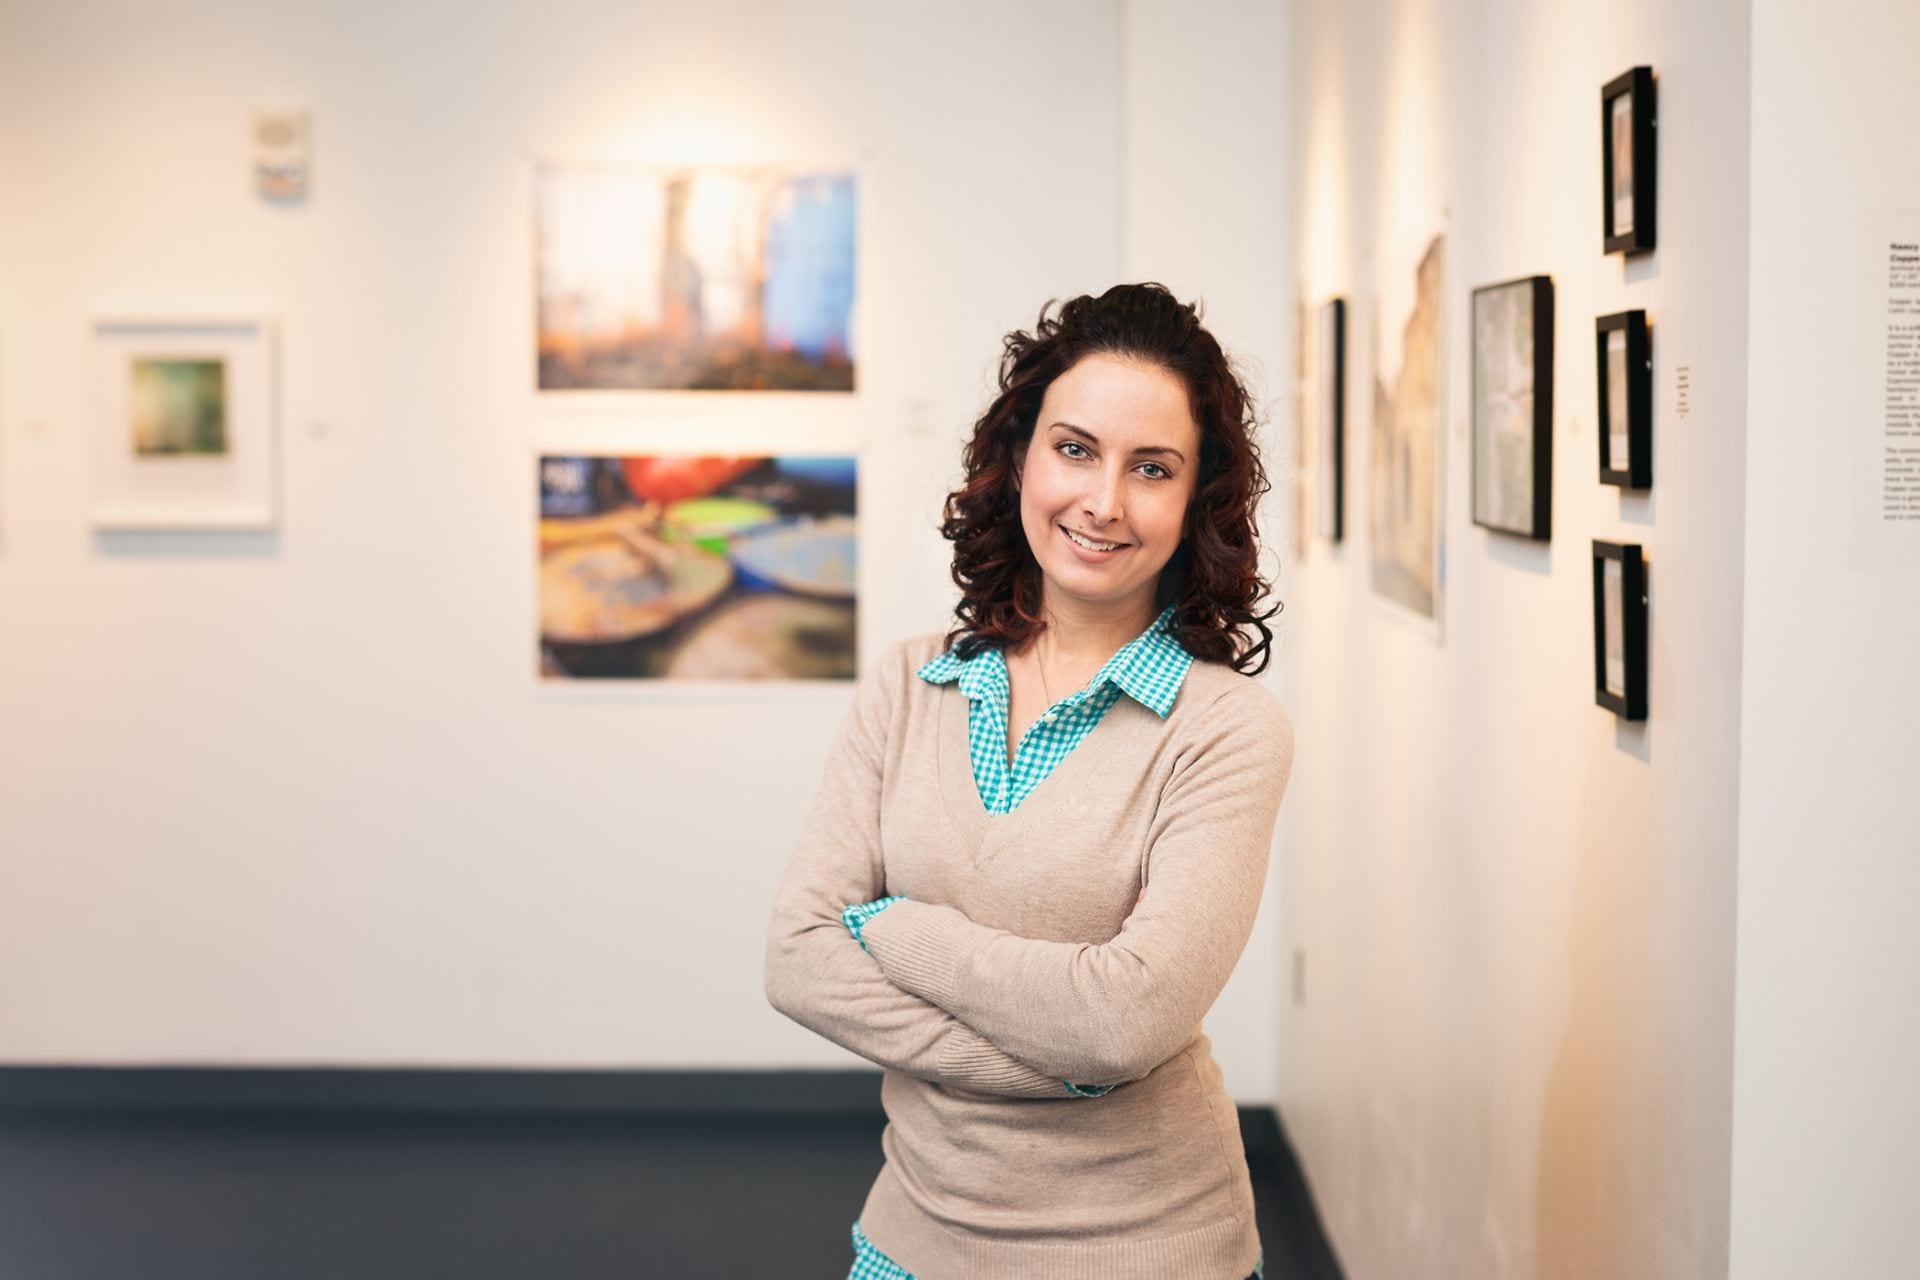 Amelia Zytka